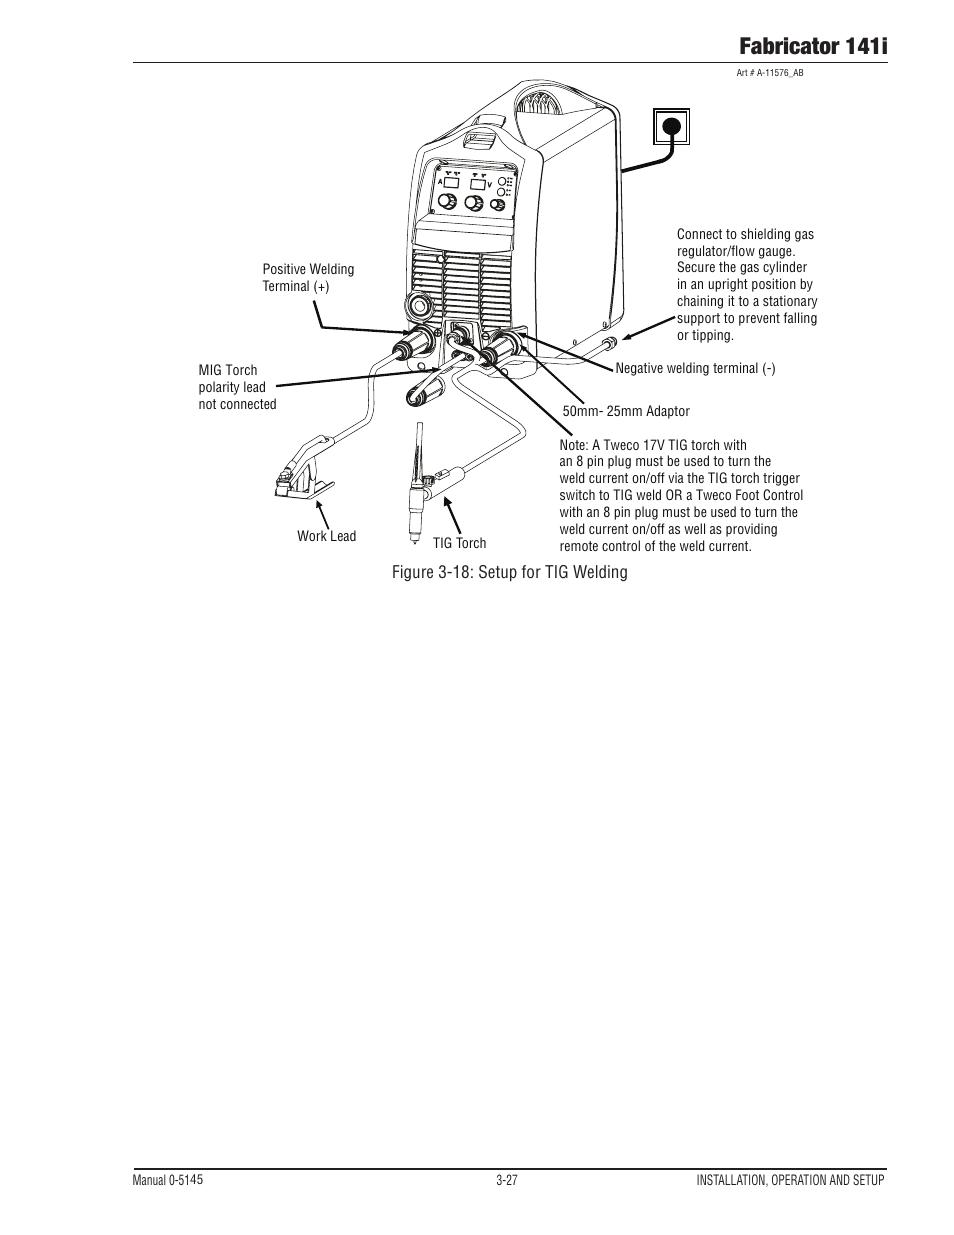 hight resolution of fabricator 141i tweco fabricator 141i operating manual user manual page 57 104